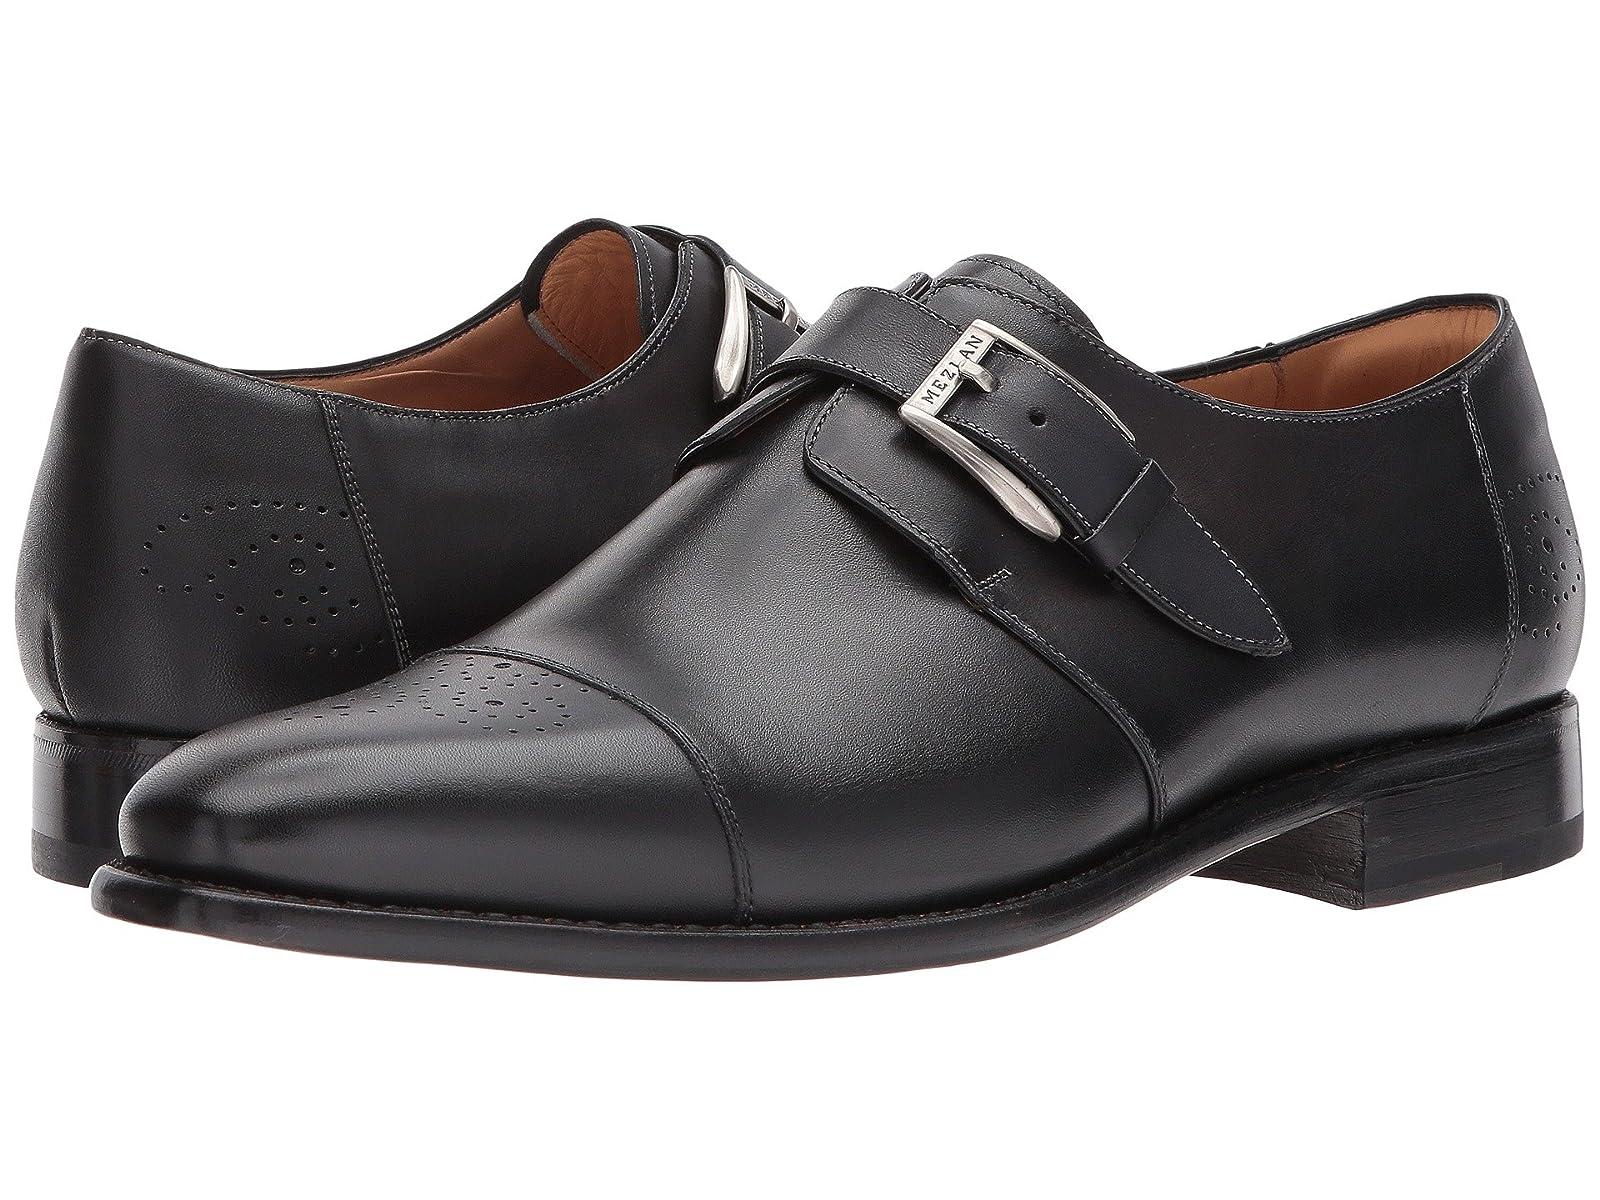 Mezlan JeanAtmospheric grades have affordable shoes